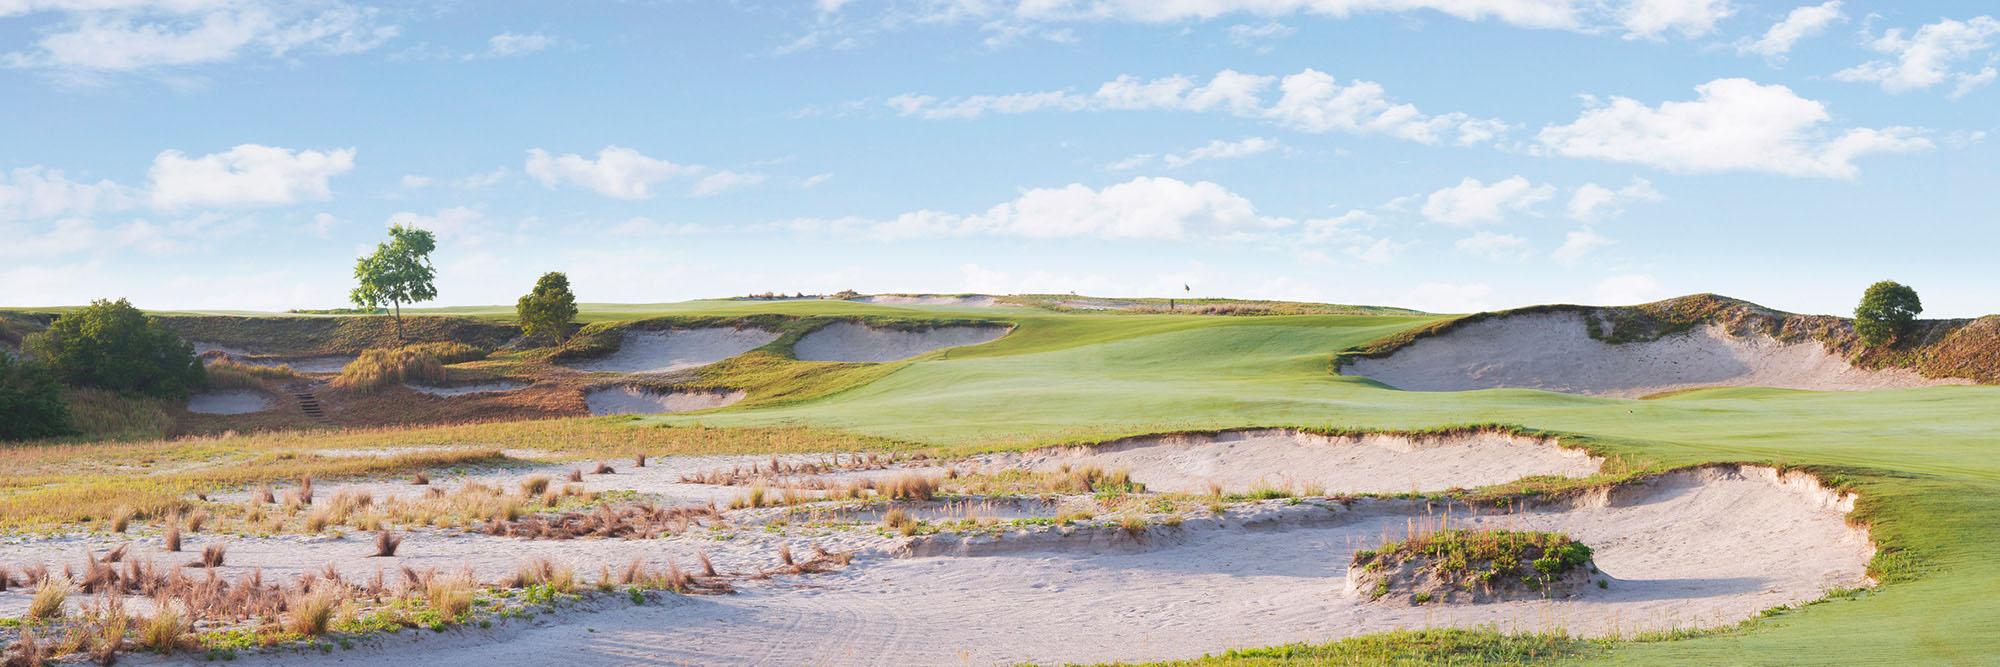 Golf Course Image - Streamsong Blue No. 4